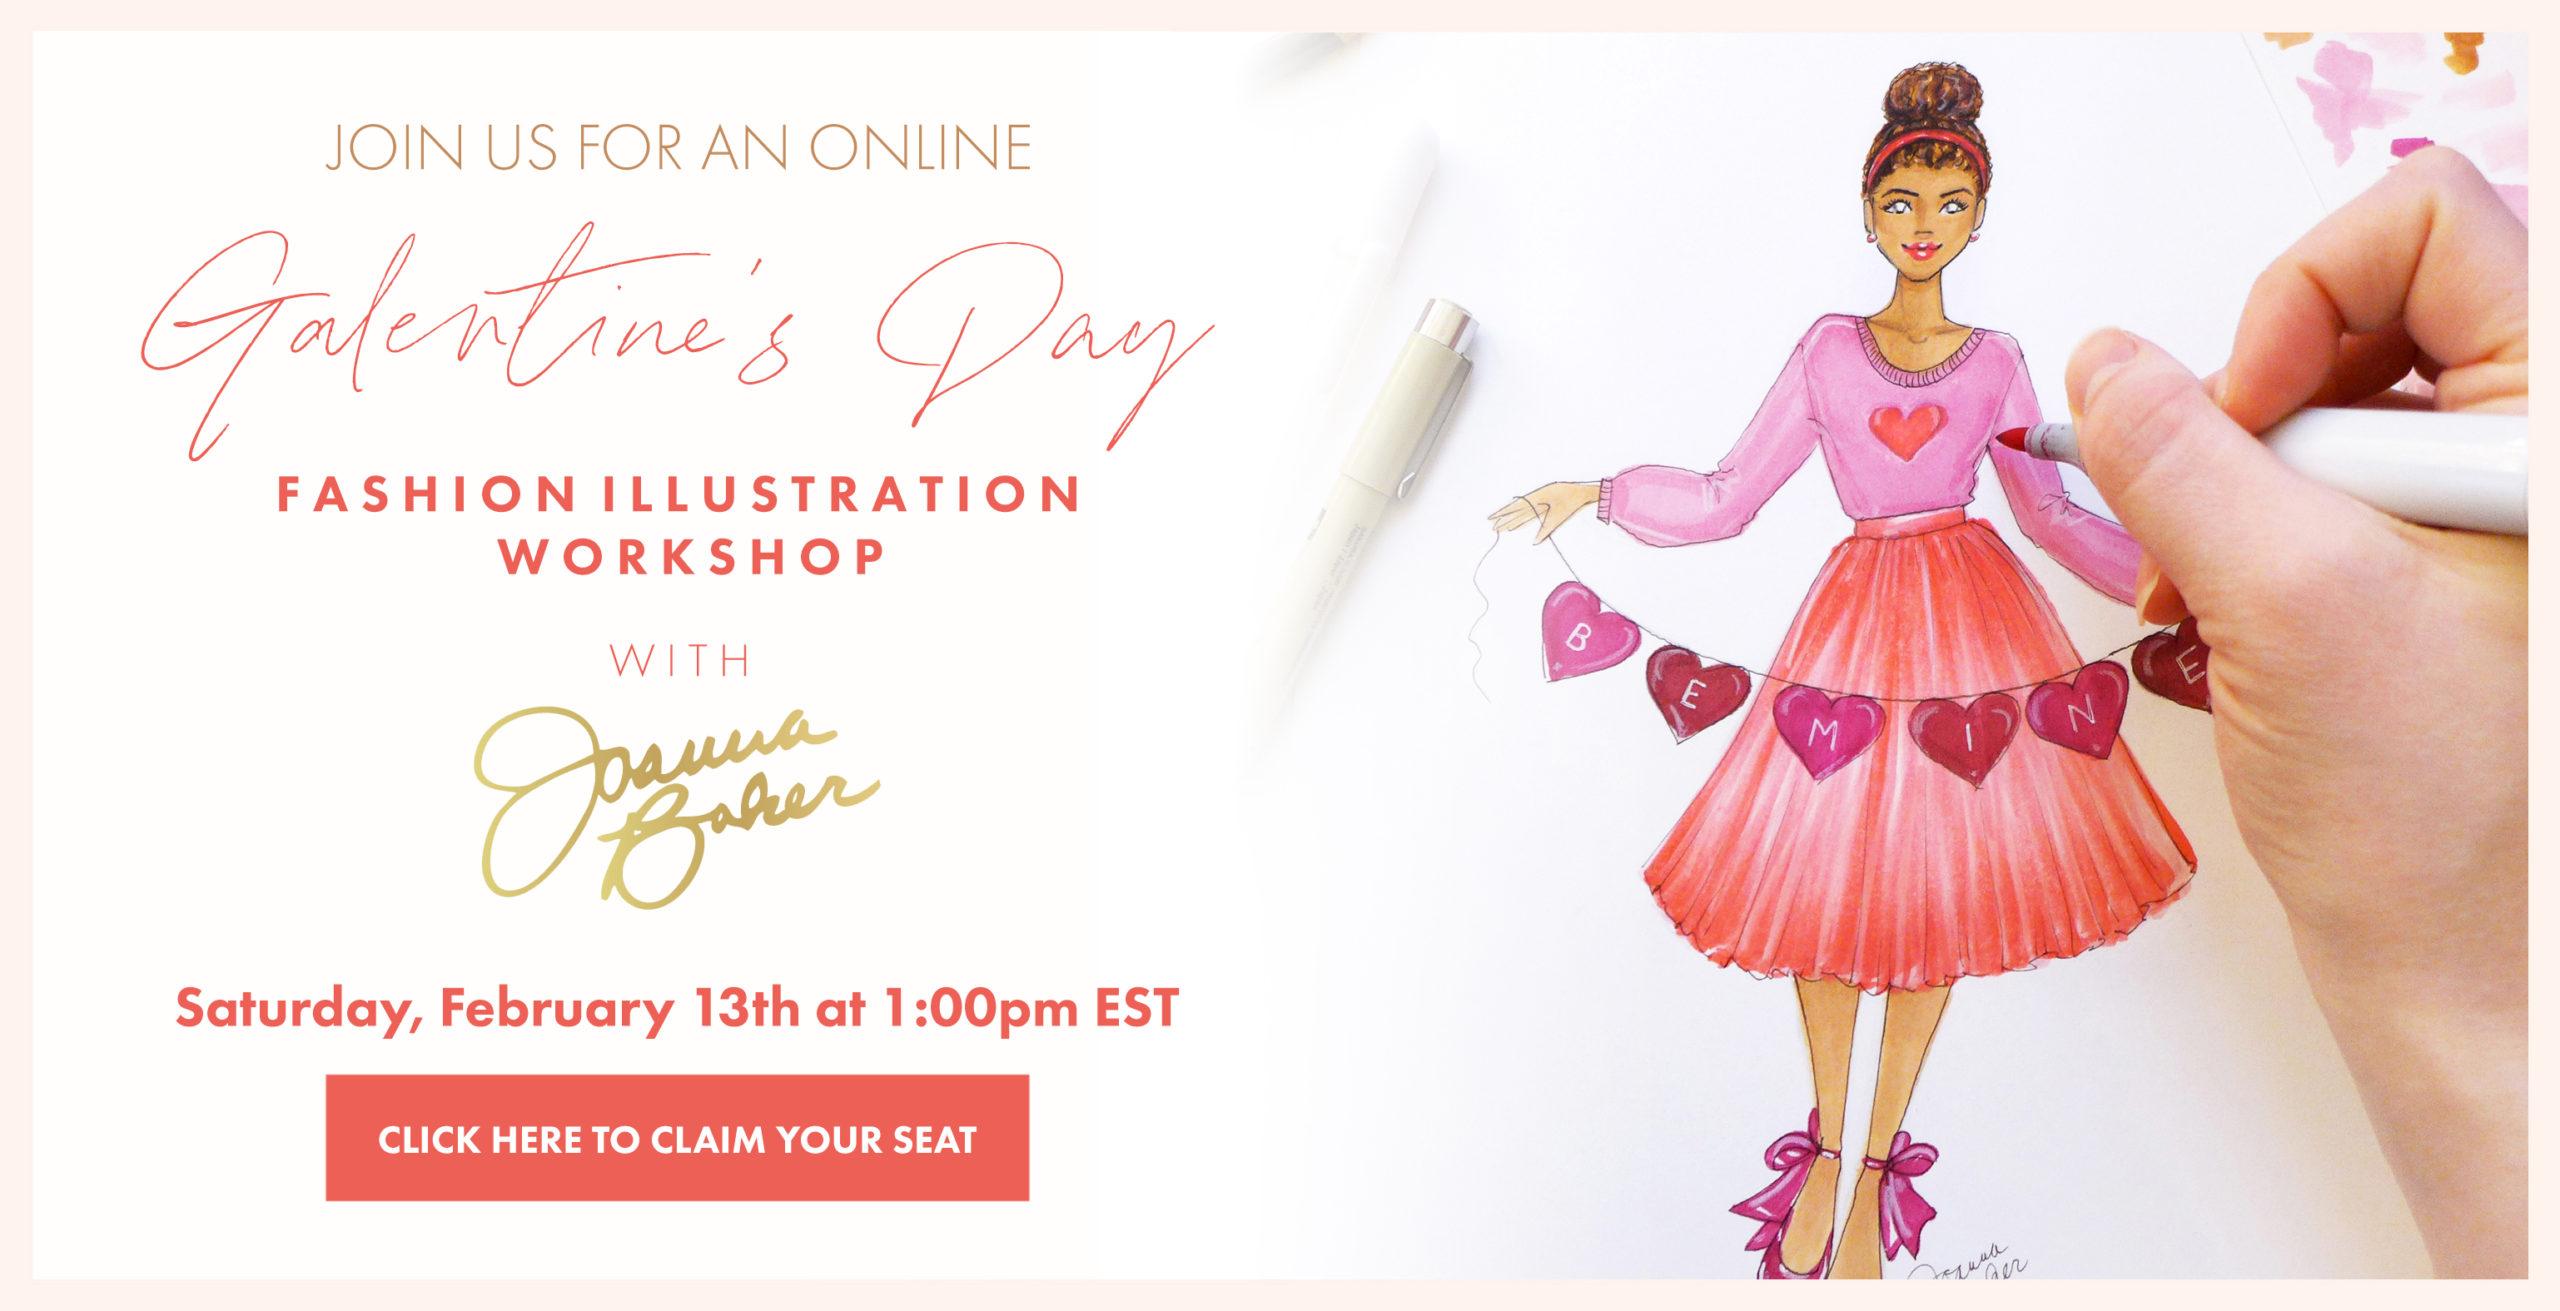 Galentine's Day Fashion Illustration Workshop